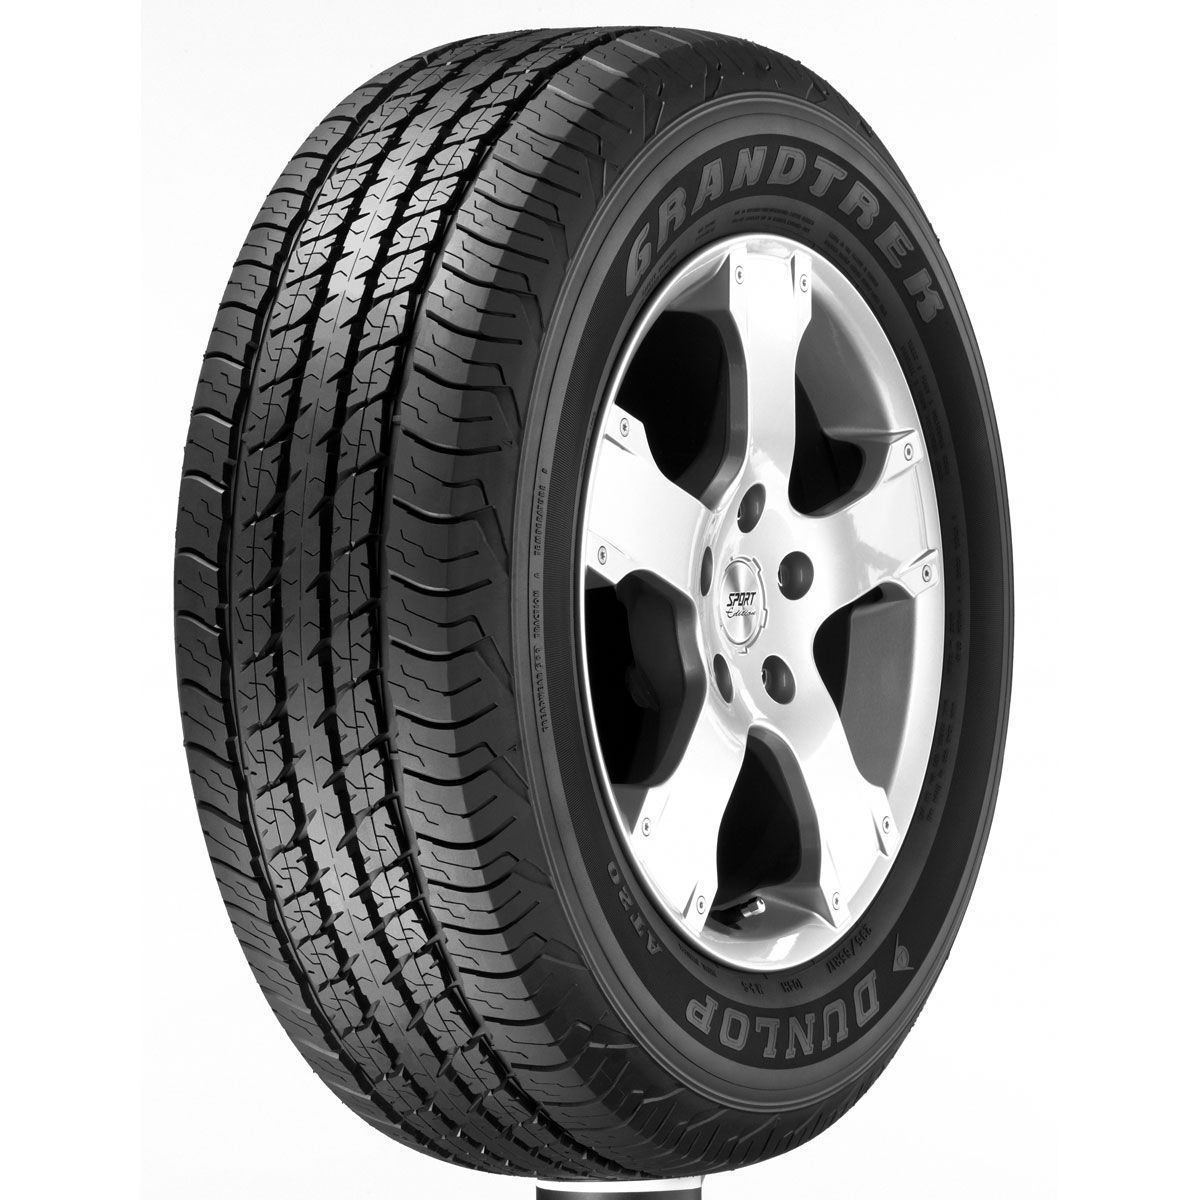 Pneu Dunlop 225/65 R17 102V GRANDTREK PT3